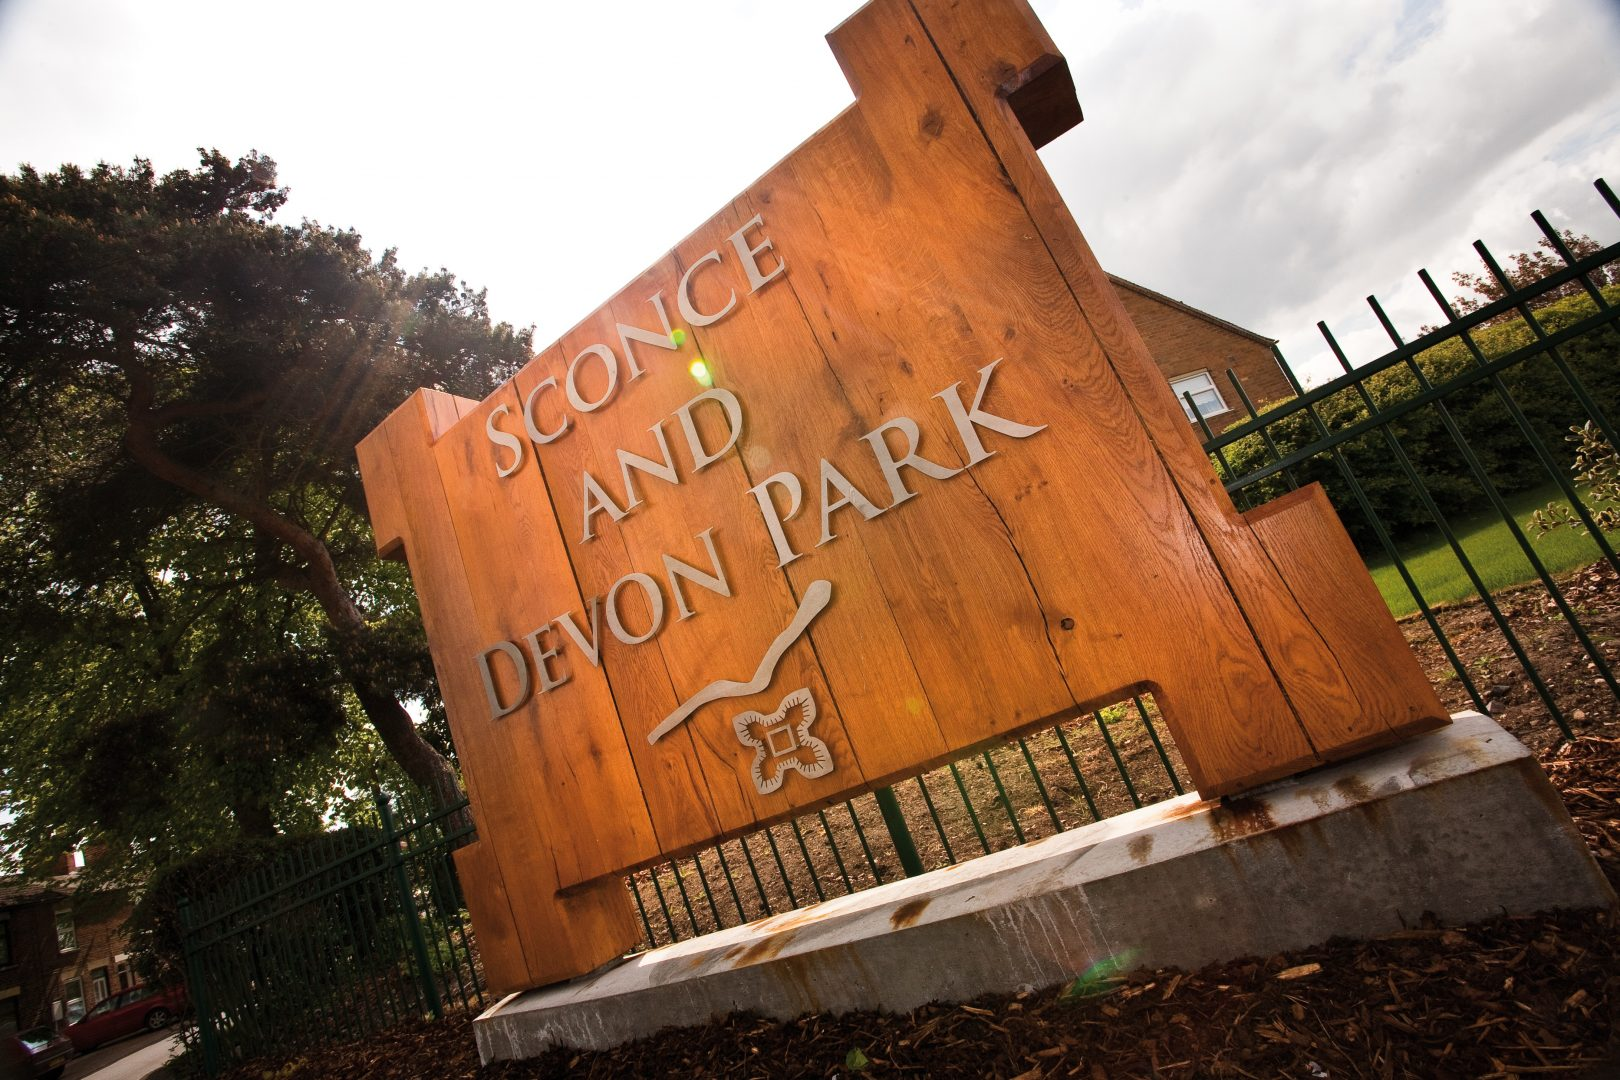 Sconce and Devon Park